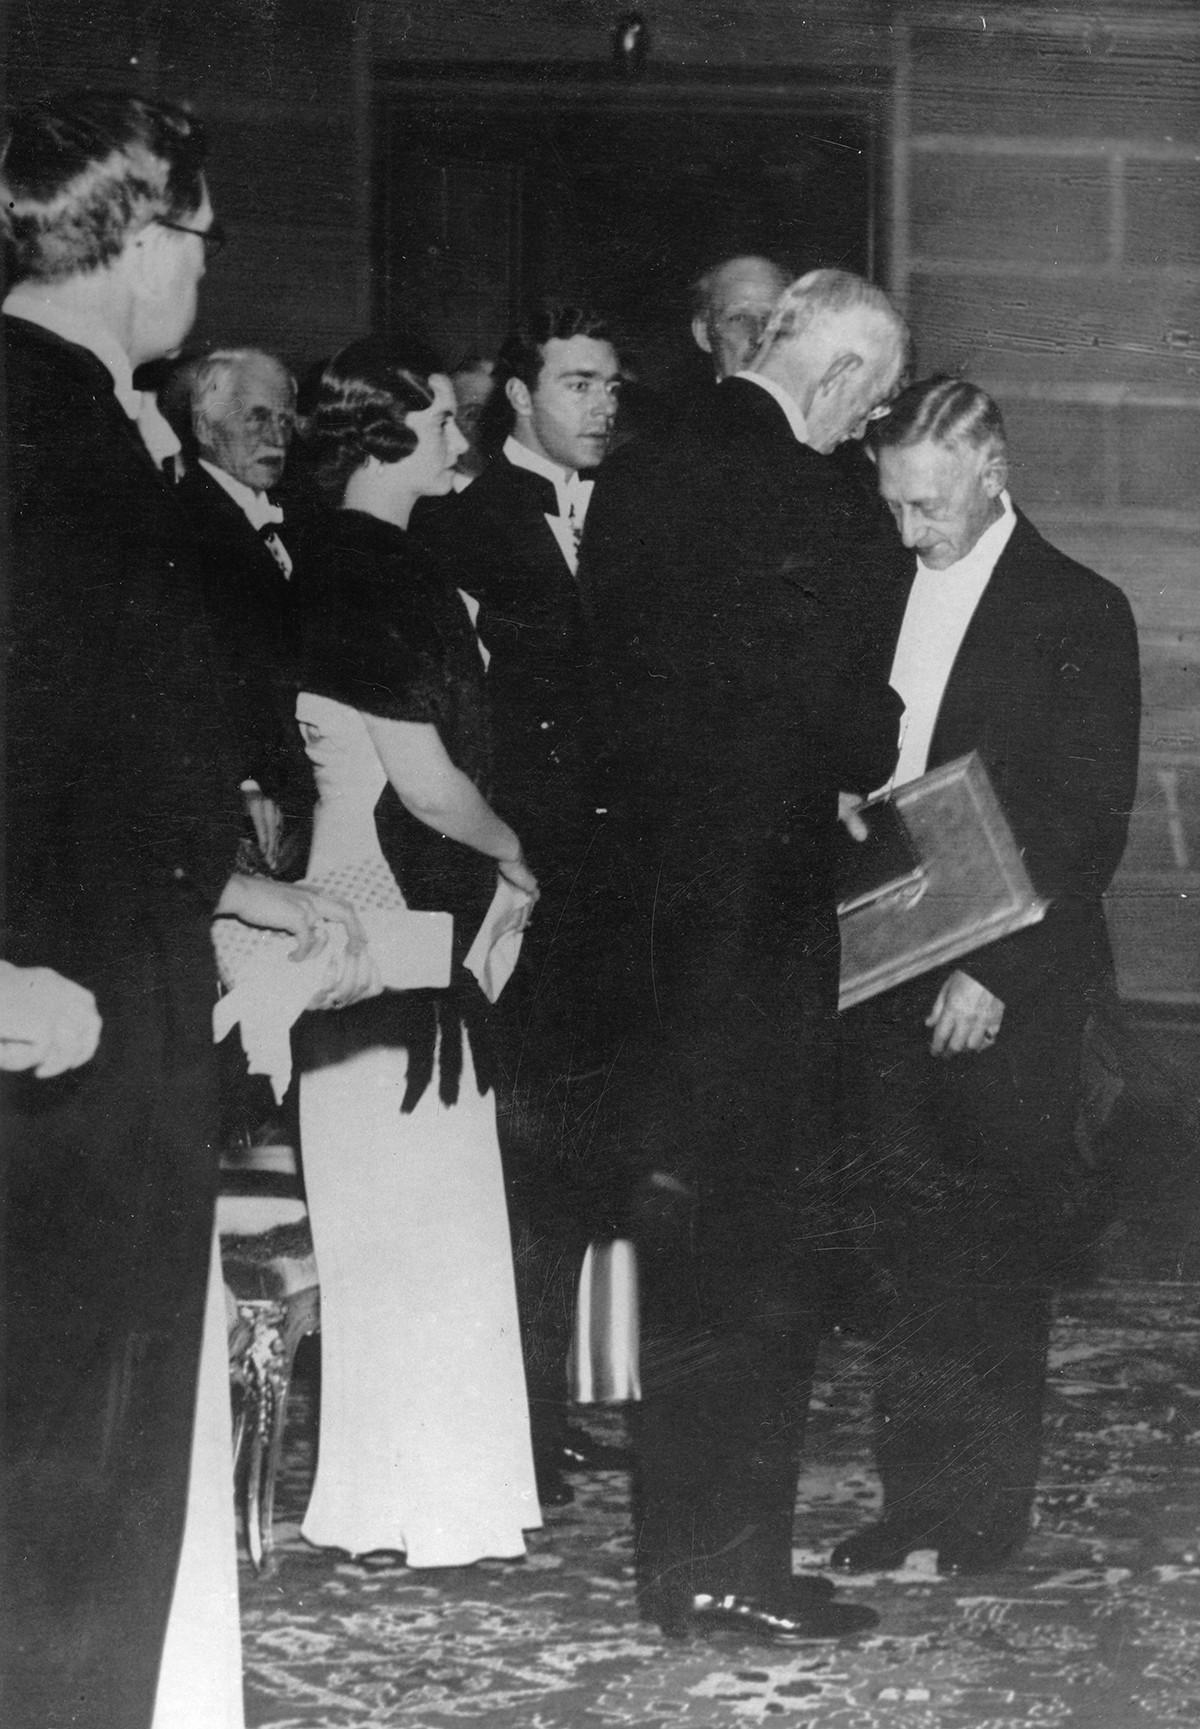 Iwan Bunin bei der Nobelpreisverleihung